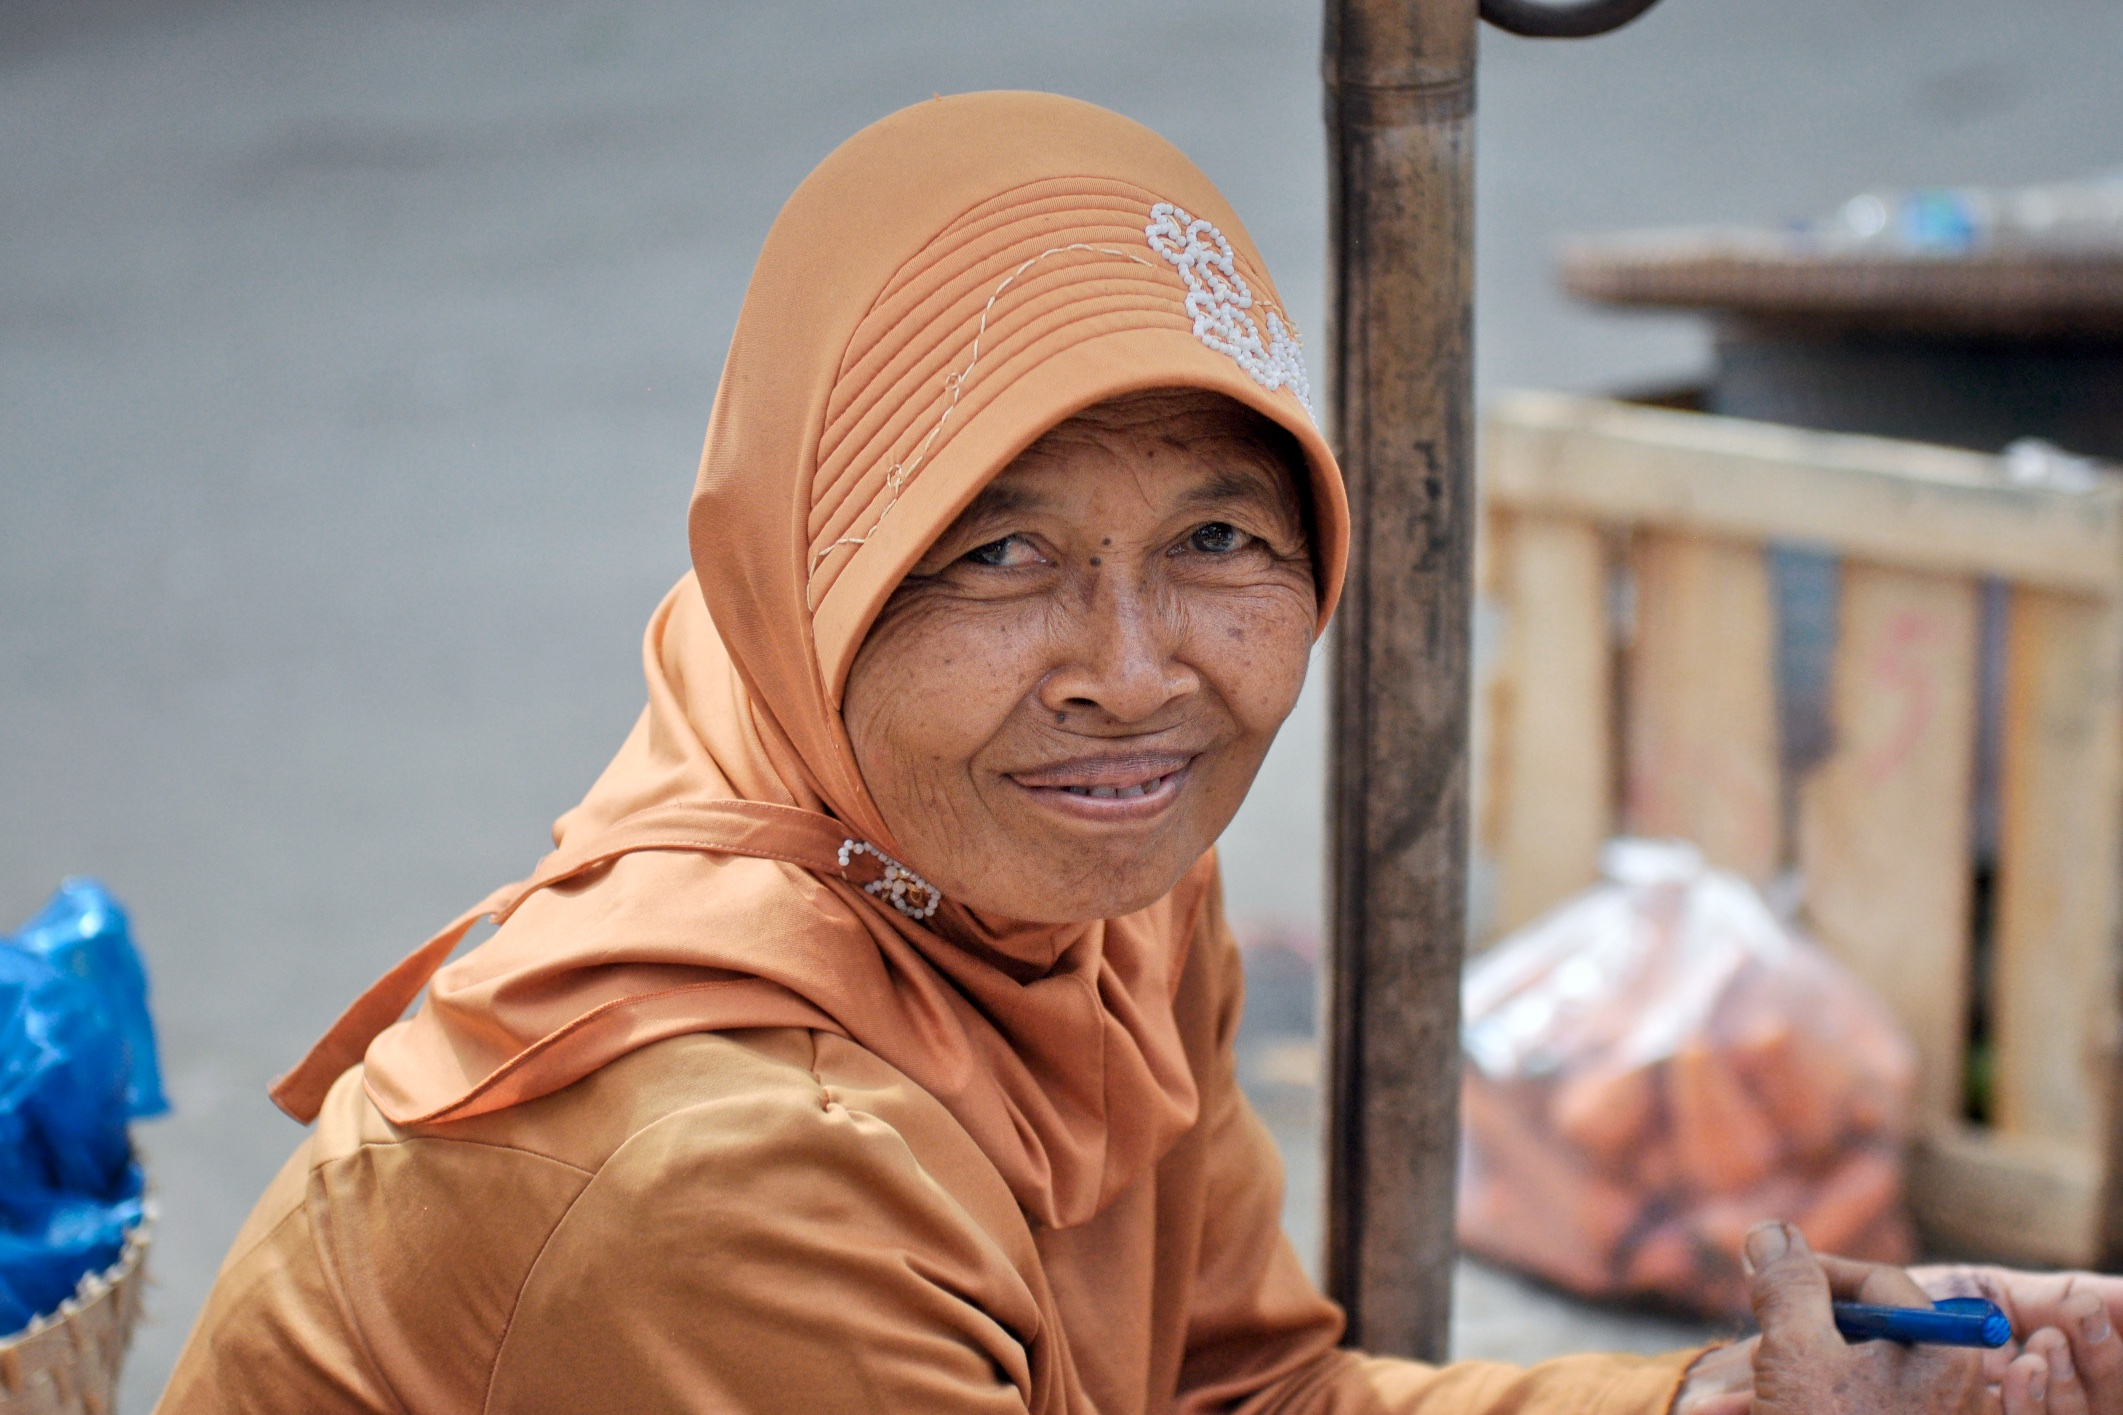 Smiling local vendor at Borobudur Market, Central Java, Indonesia| © Chavelli Tsui www.chavelli.com